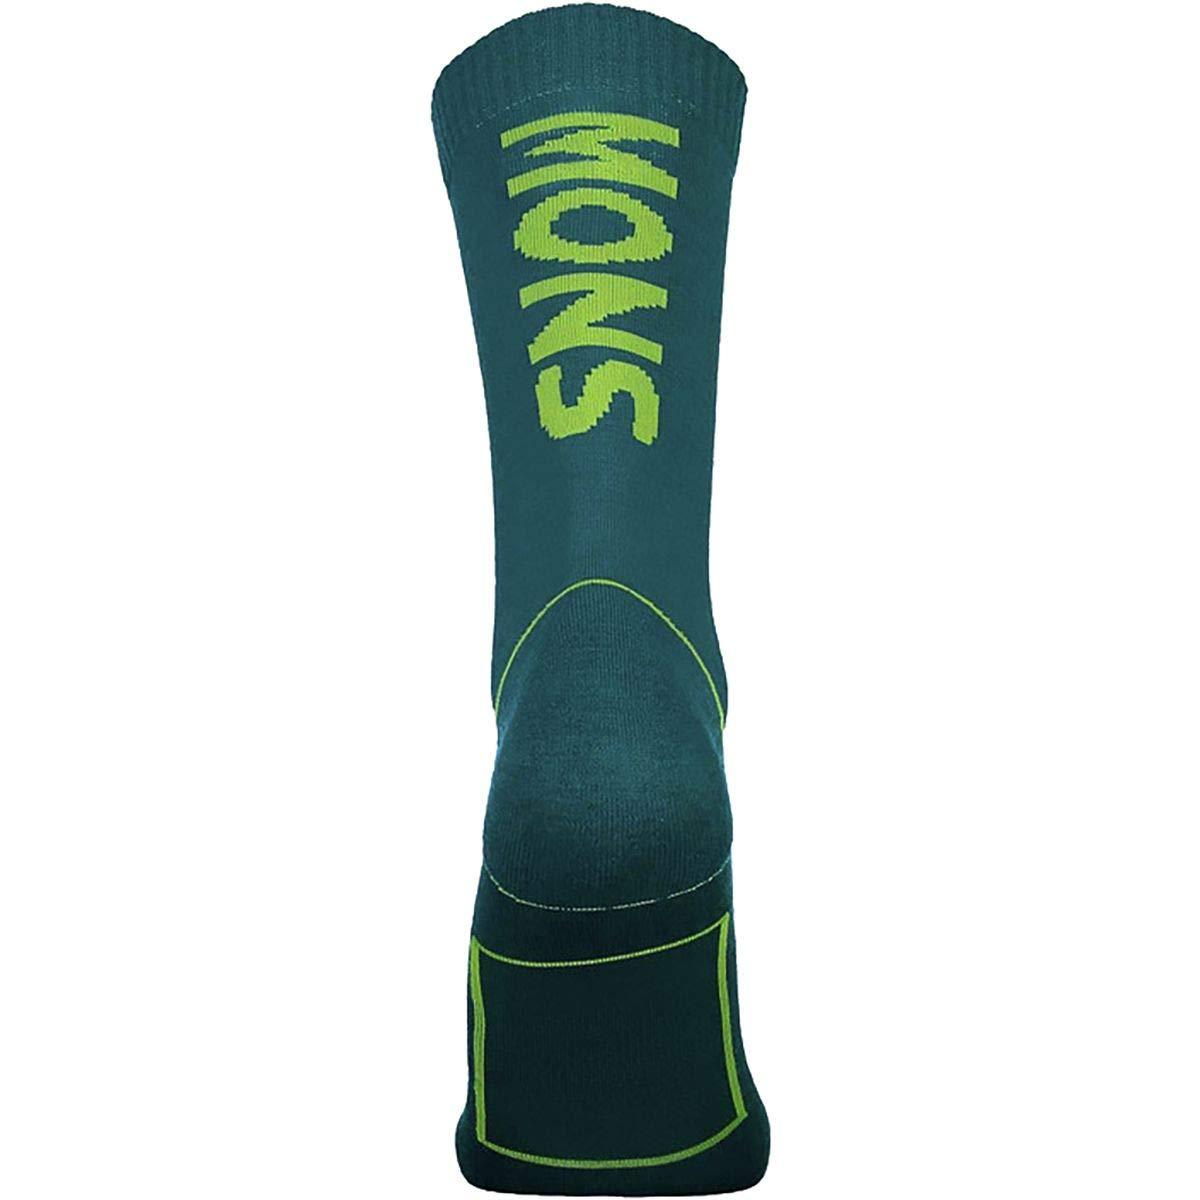 Mons Royale Tech 2.0 Bike Sock Mens